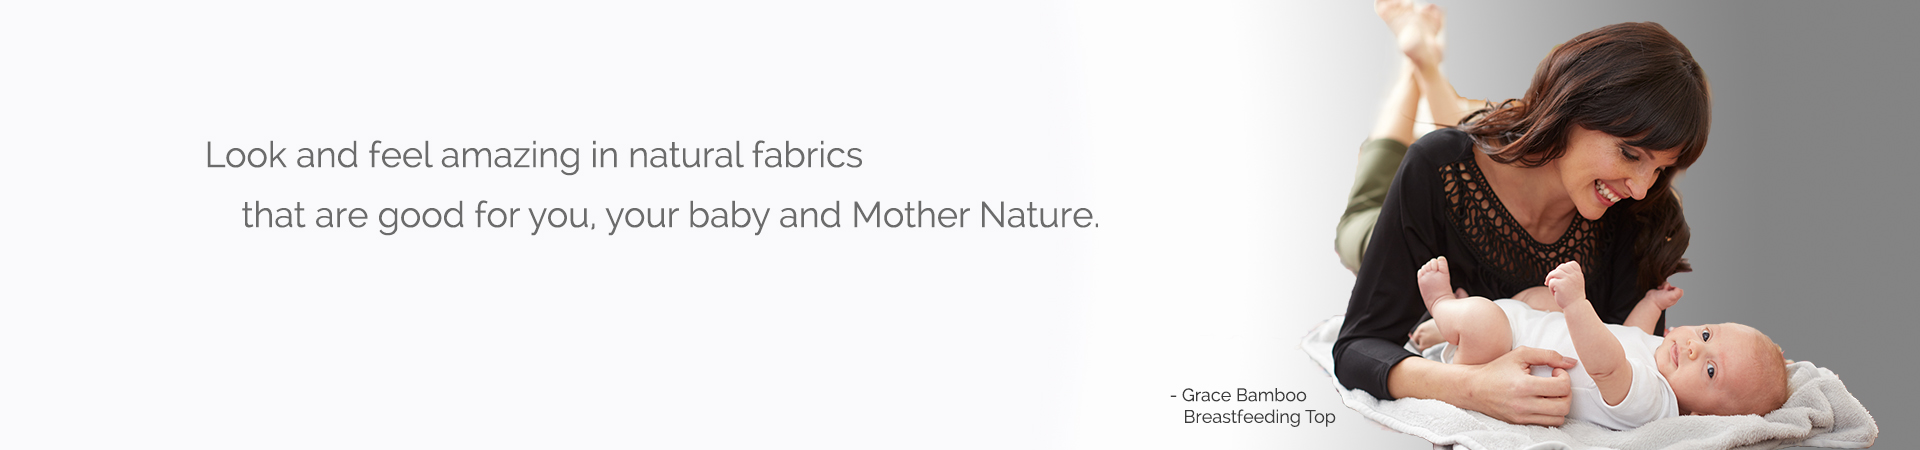 Stylish Maternity & Breastfeeding Clothes